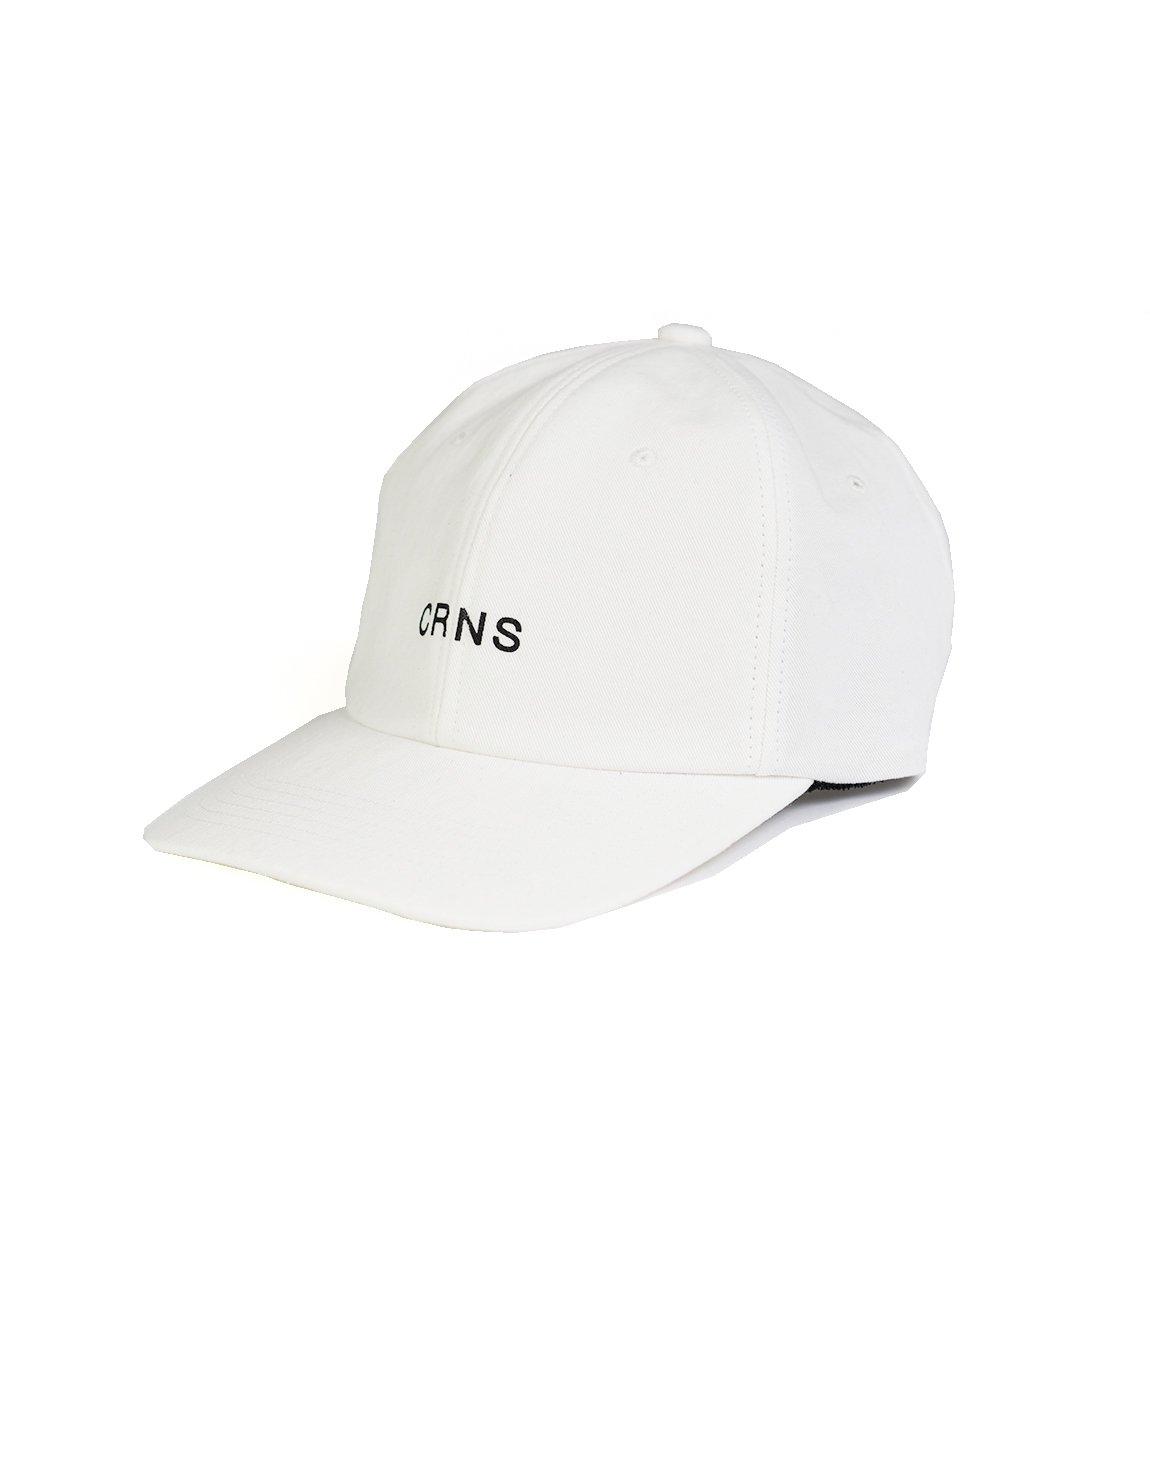 CRNS WASH LOGO CAP WHITE